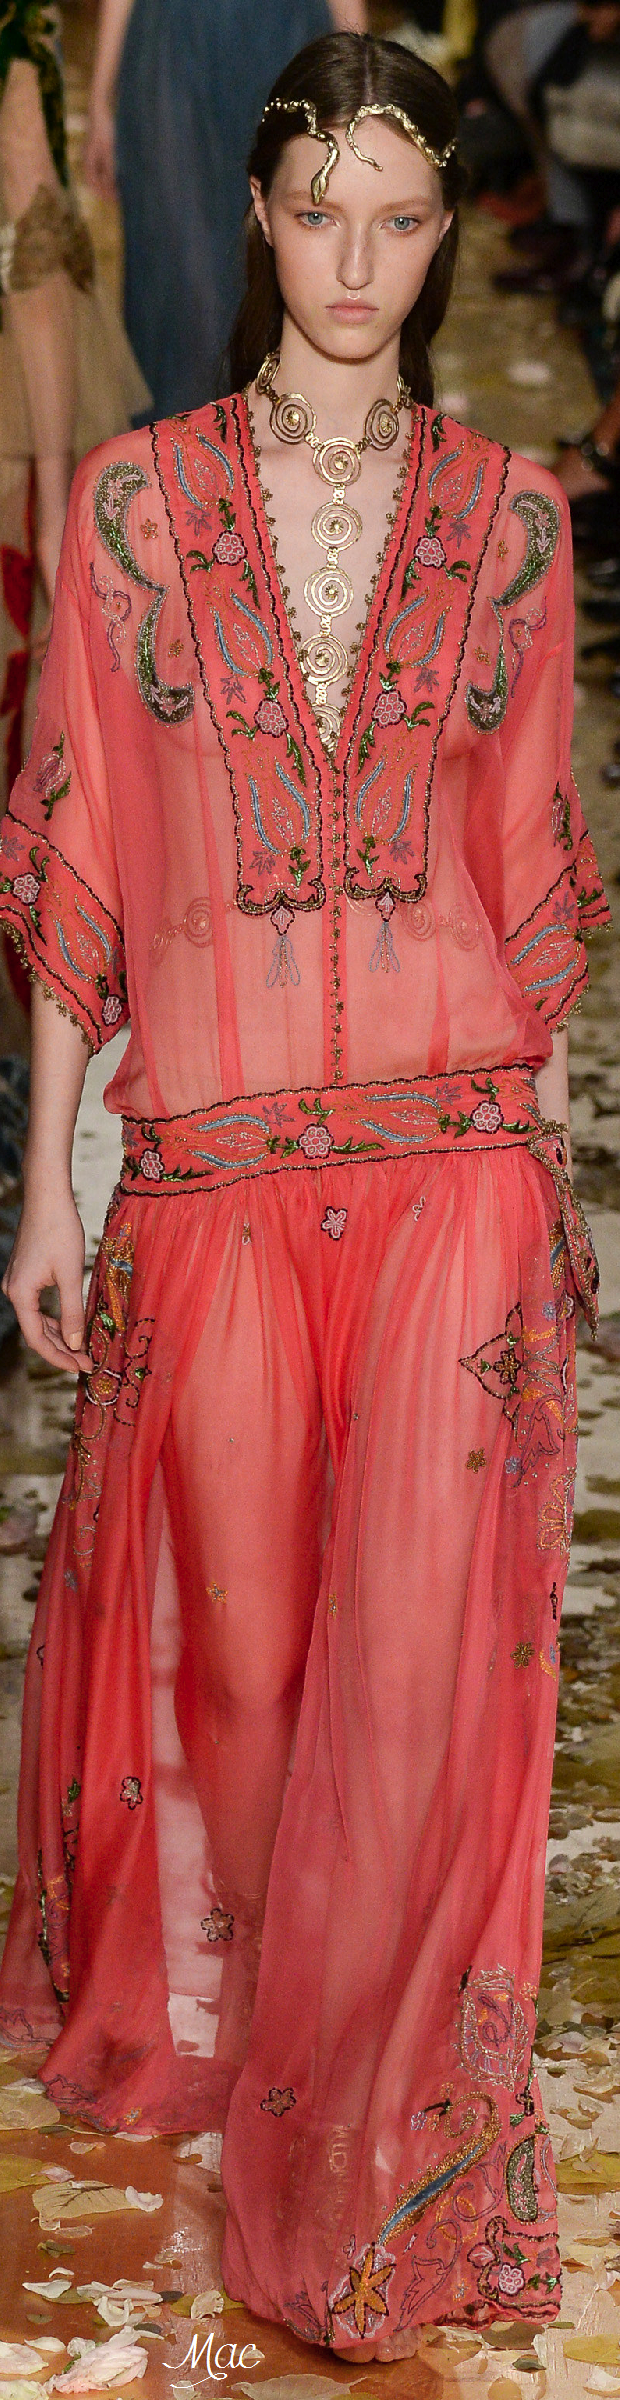 Spring 2016 Haute Couture Valentino   vestits   Pinterest   Ropa ...